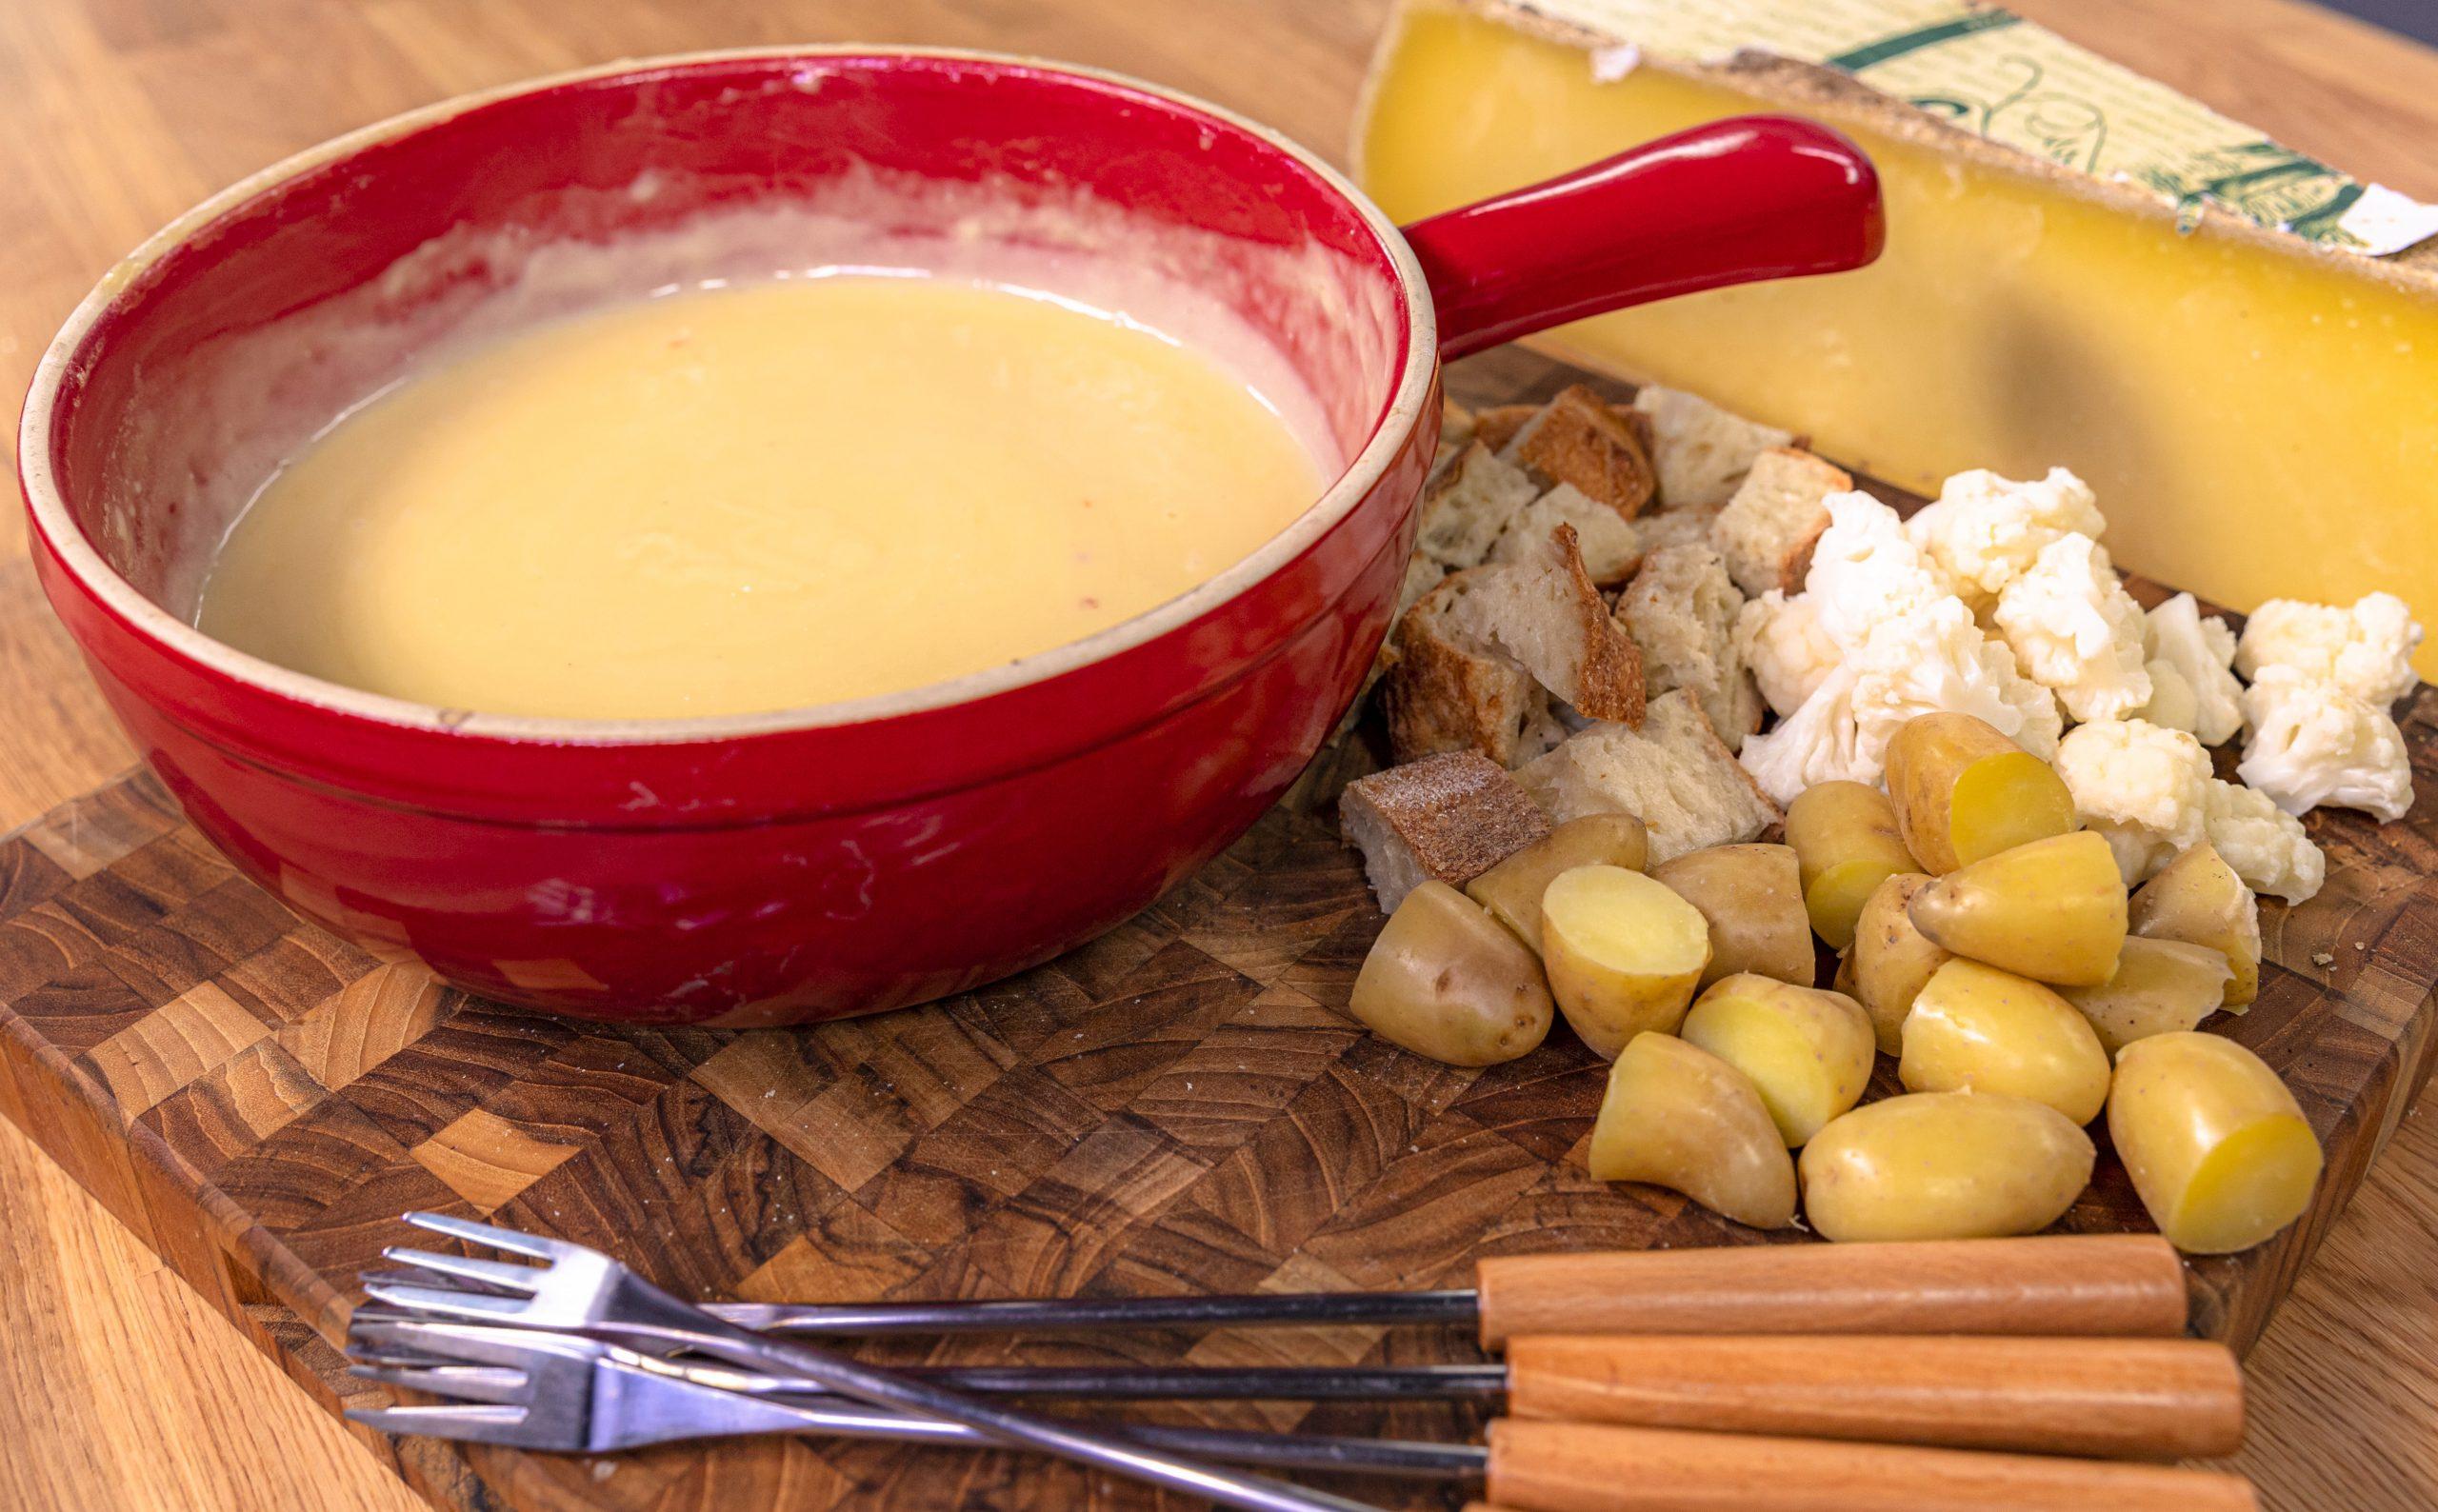 Plato elaborado con fondue de queso Raymond con pan y verduras para mojar